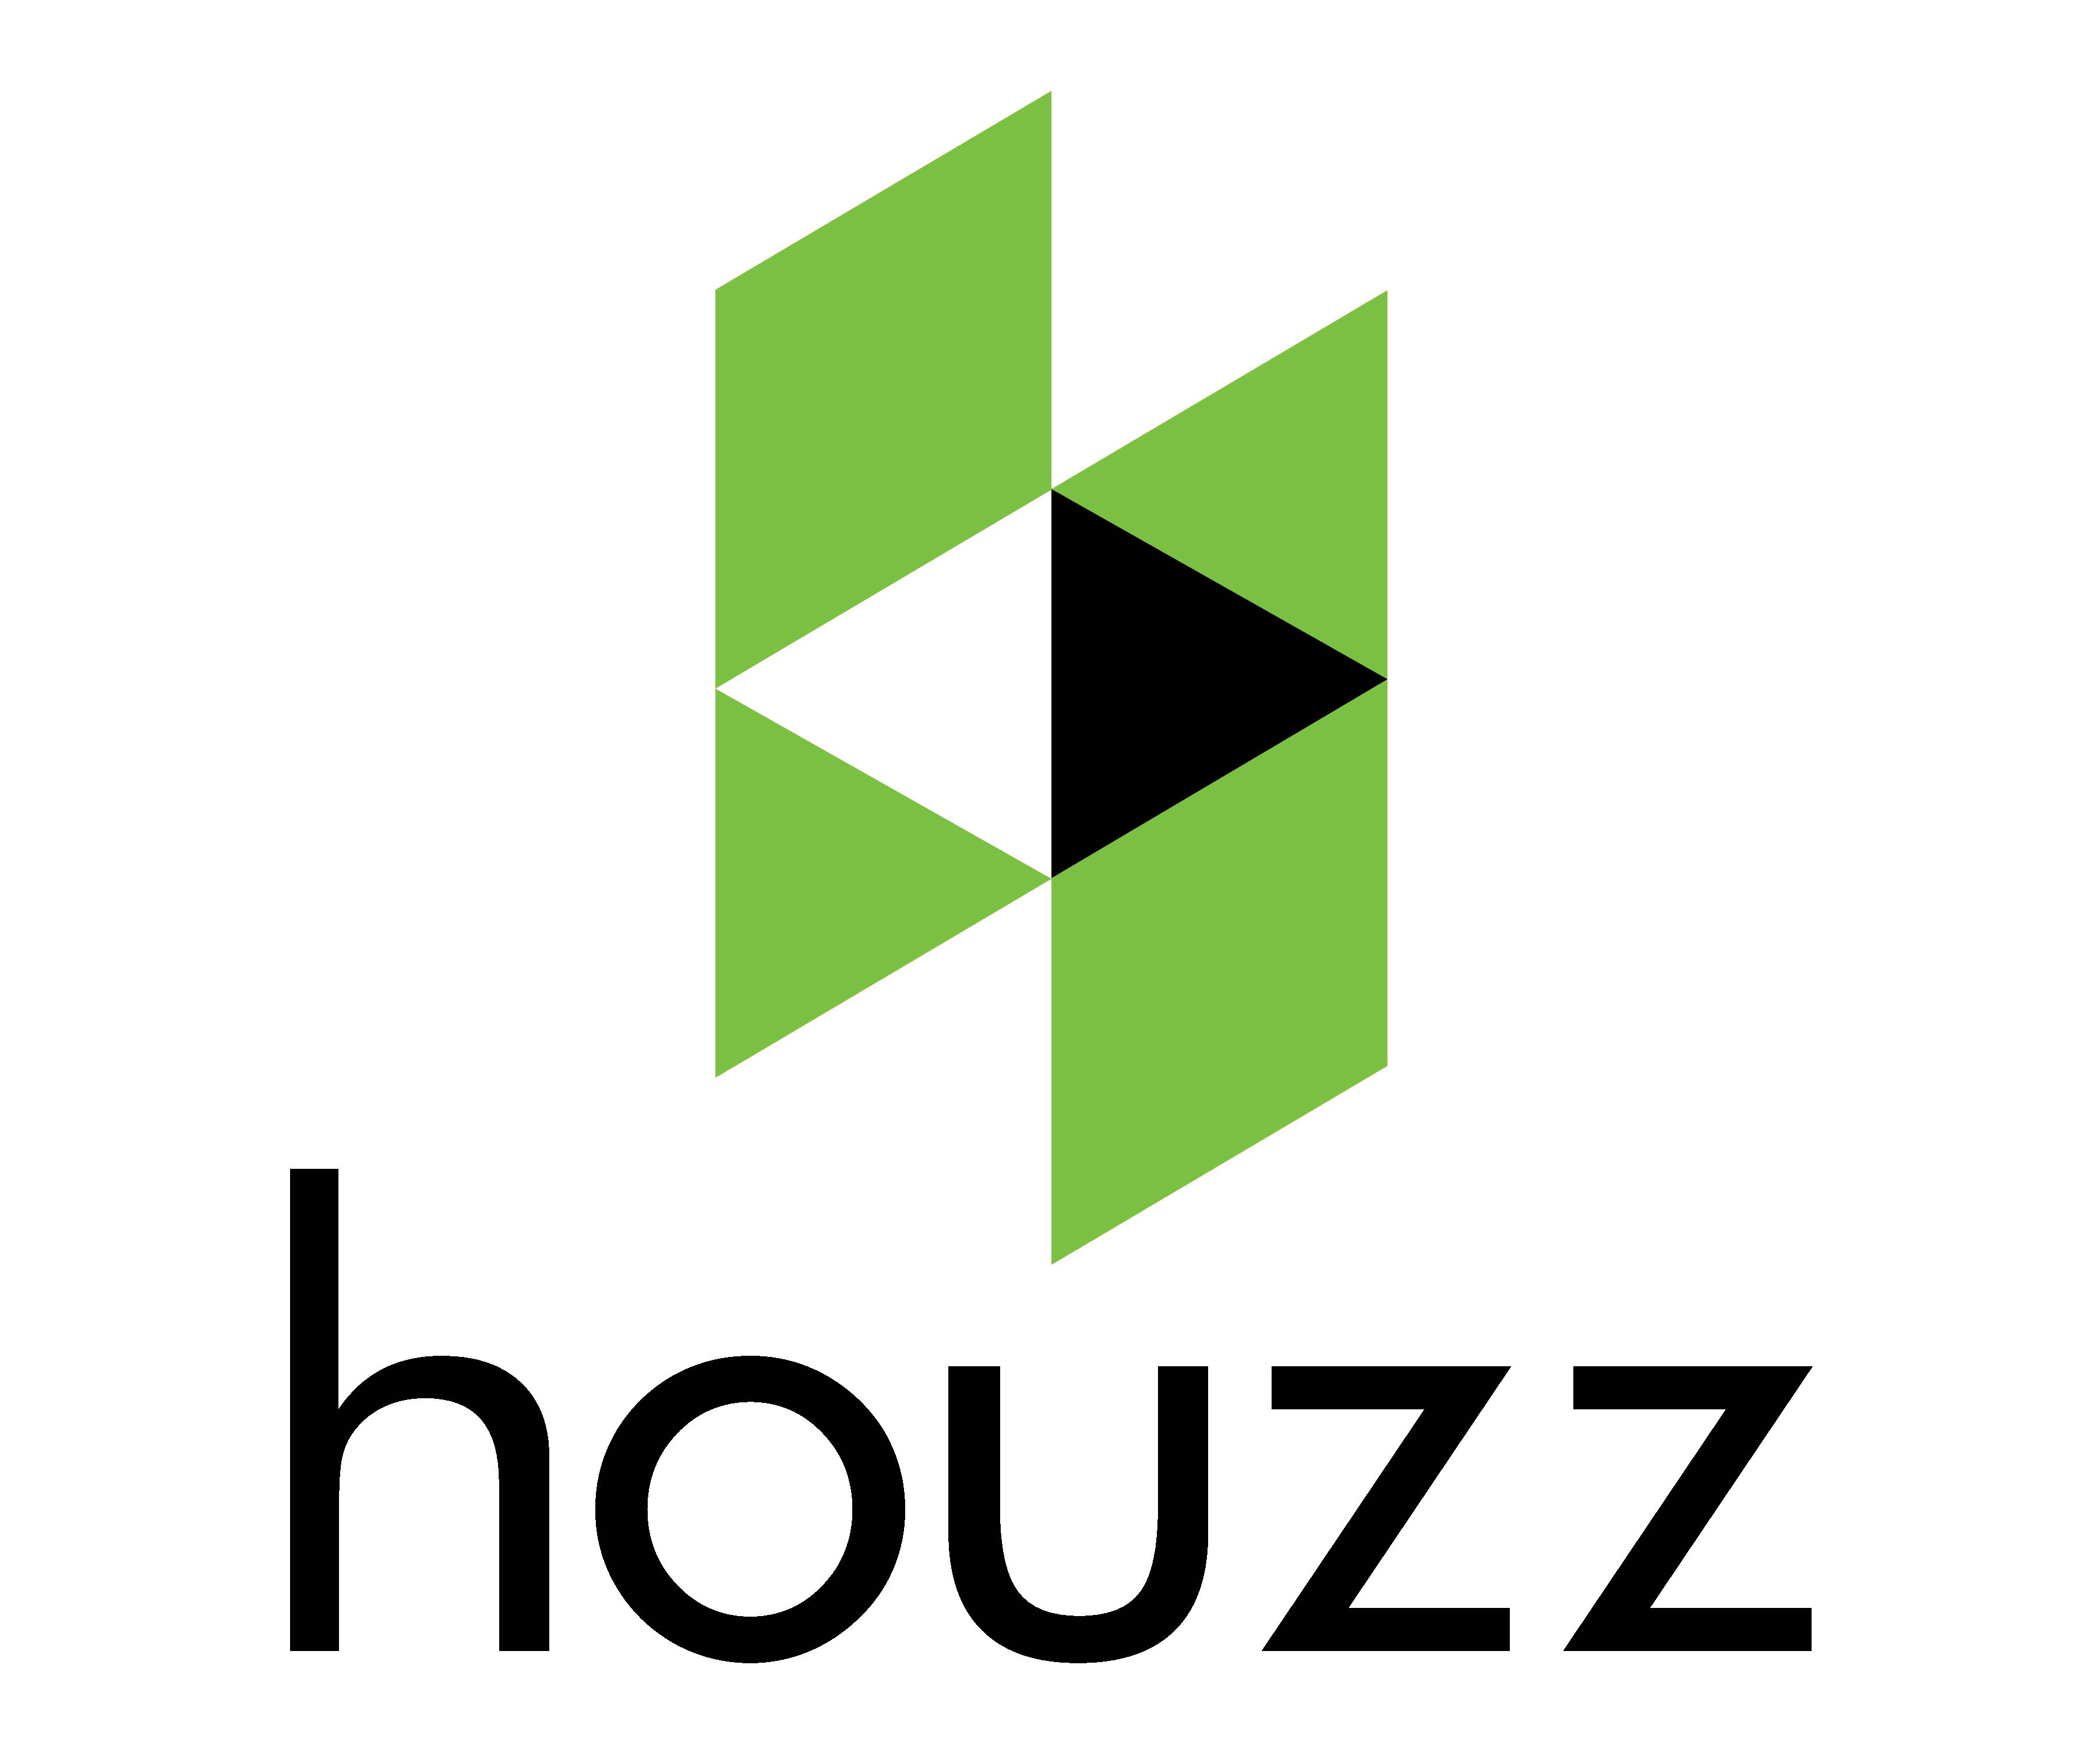 Houzz Logo Houzz Symbol Meaning History And Evolution